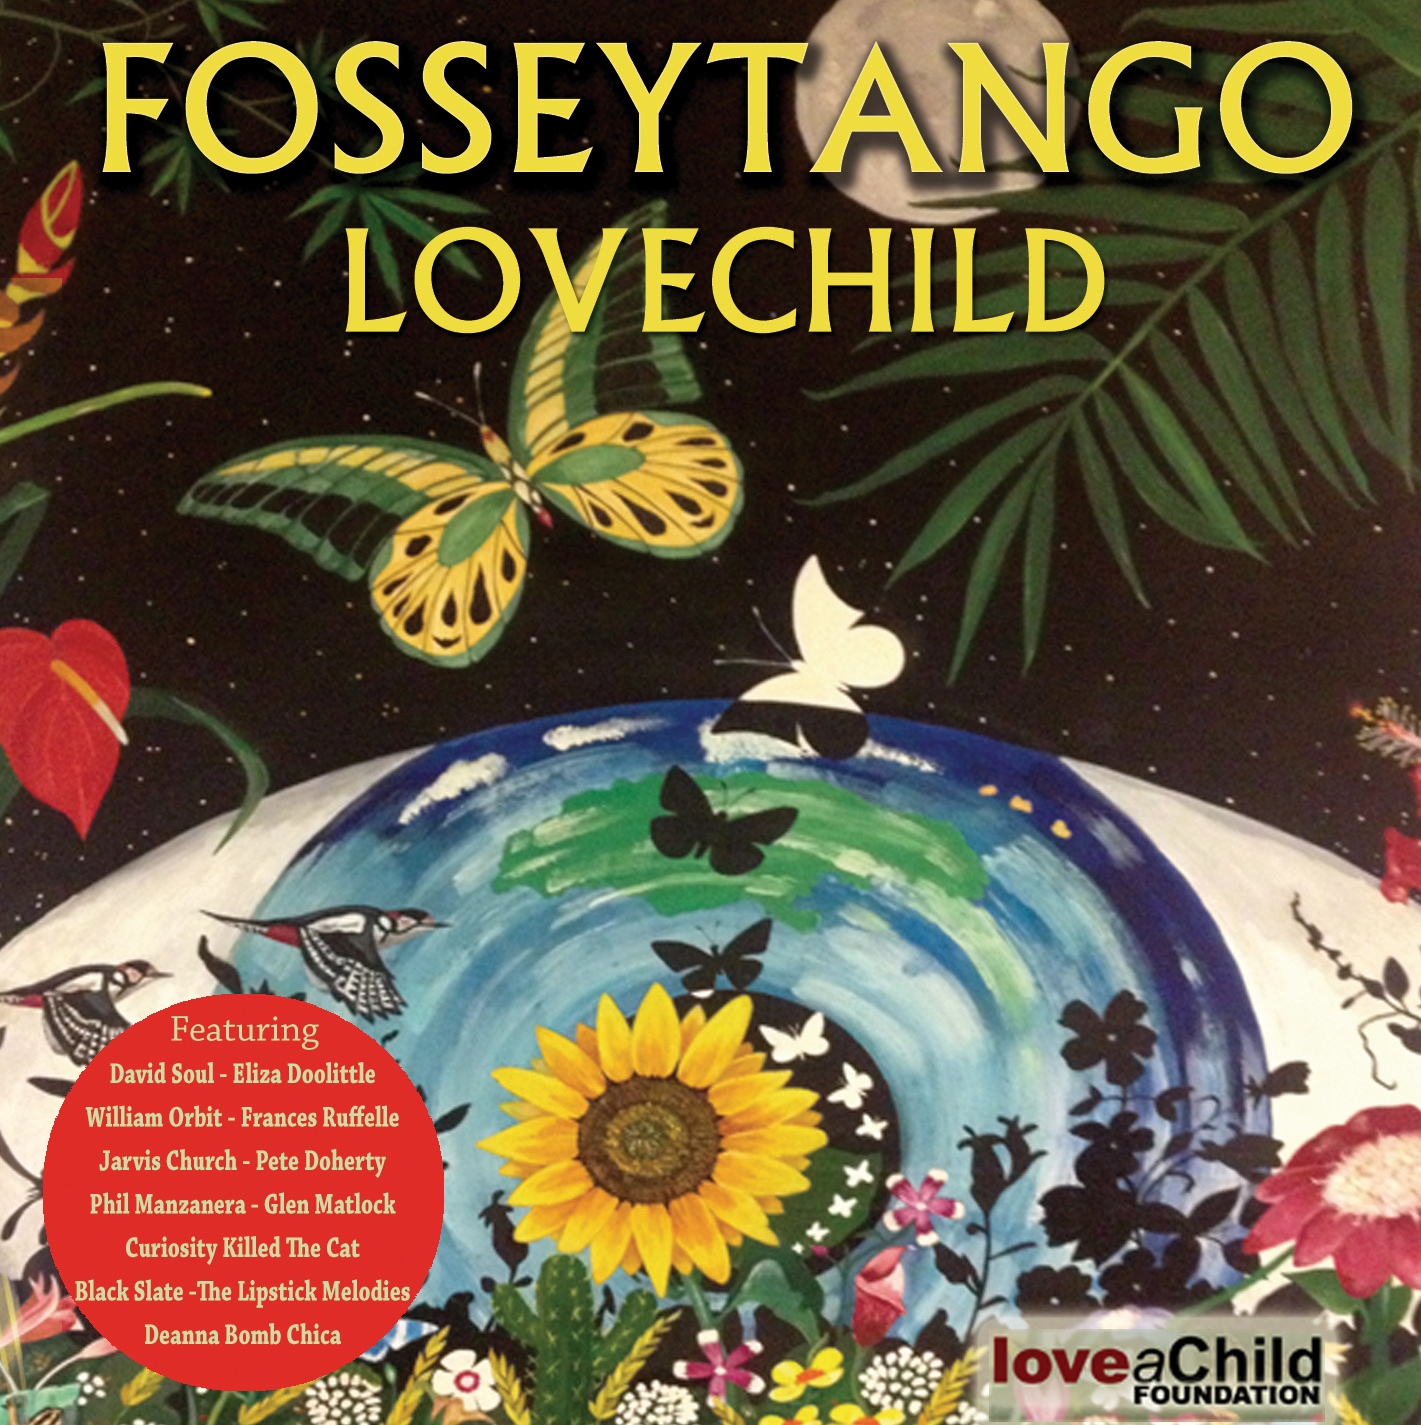 FosseyTango